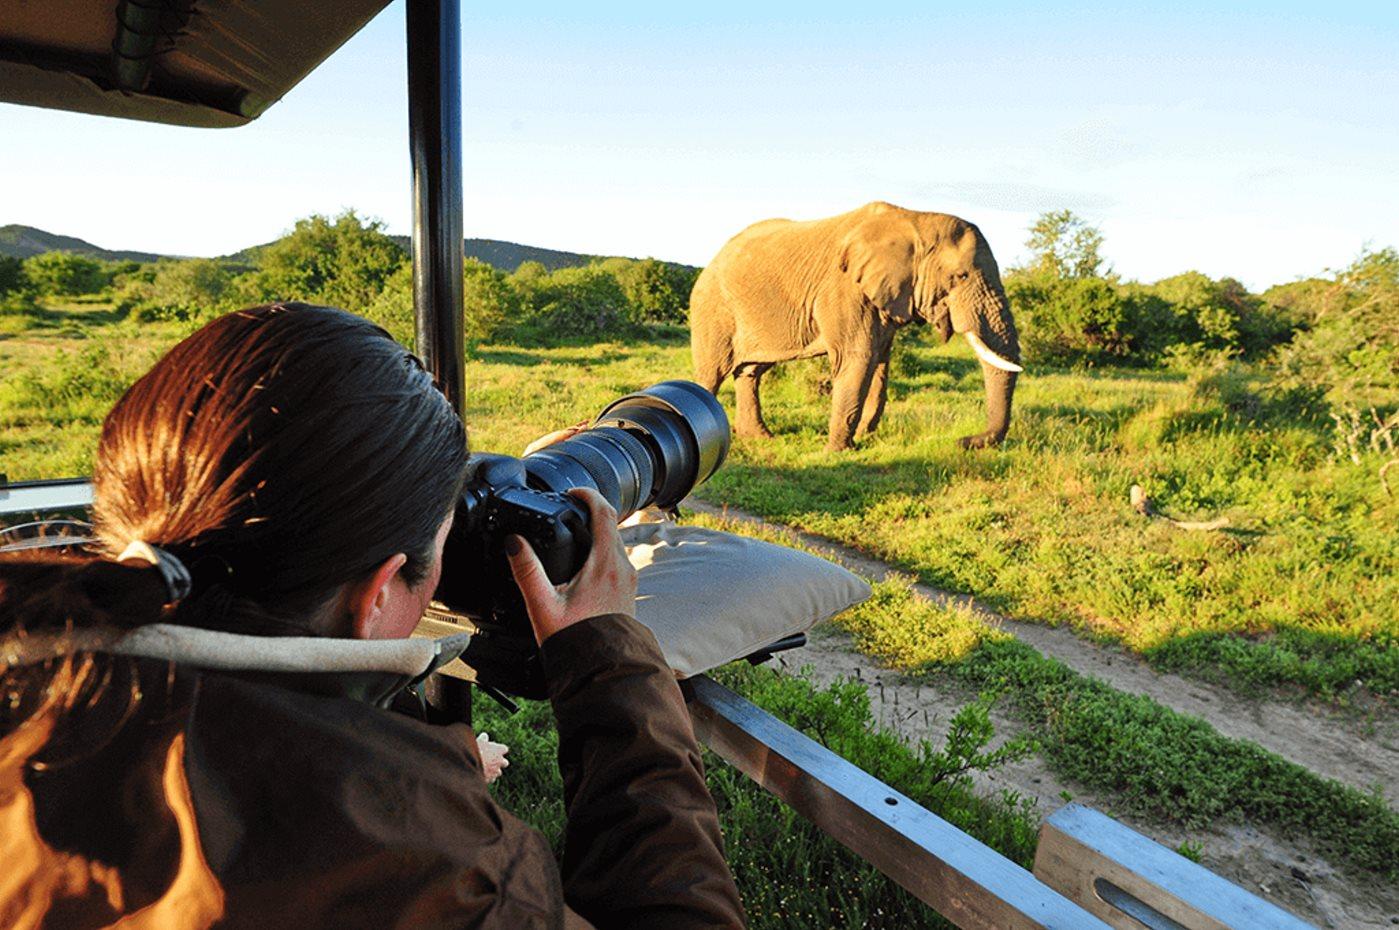 photographysafari 2 - Tips to Take Awesome Photos During a Safari